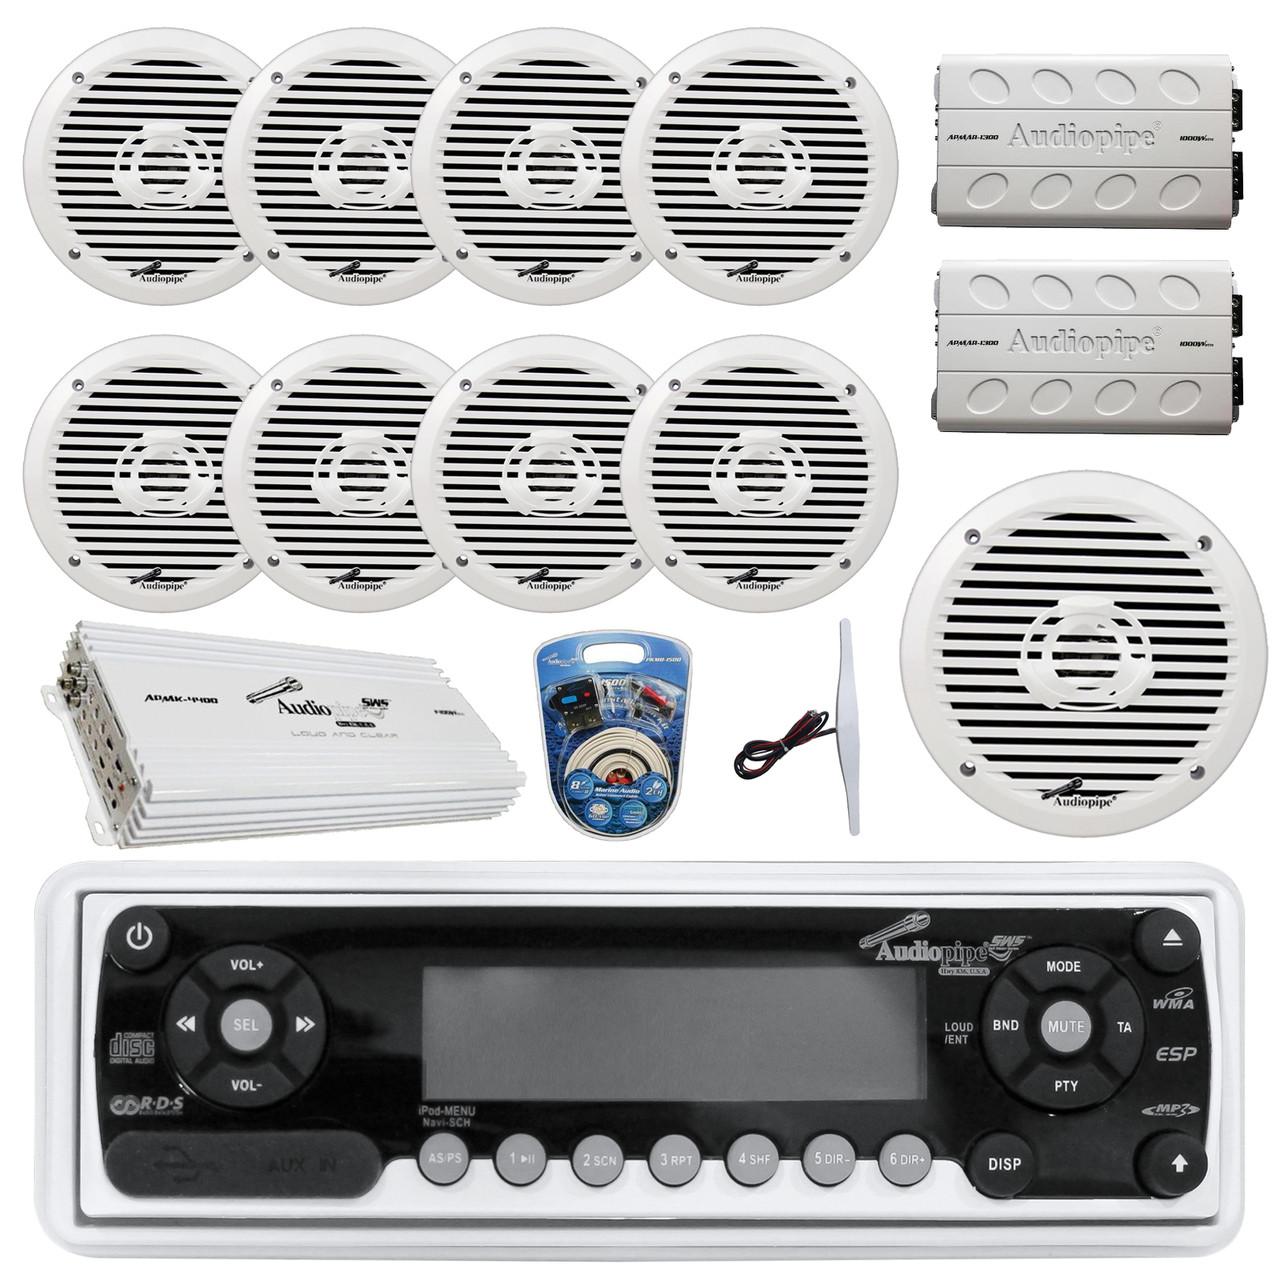 36 42 boat audiopipe marine am fm cd receiver 8x 8 white boat speakers 2x 4 channel amp 1400w 10 subwoofer 2x mini 1000w amp 8 gauge marine  [ 1280 x 1280 Pixel ]